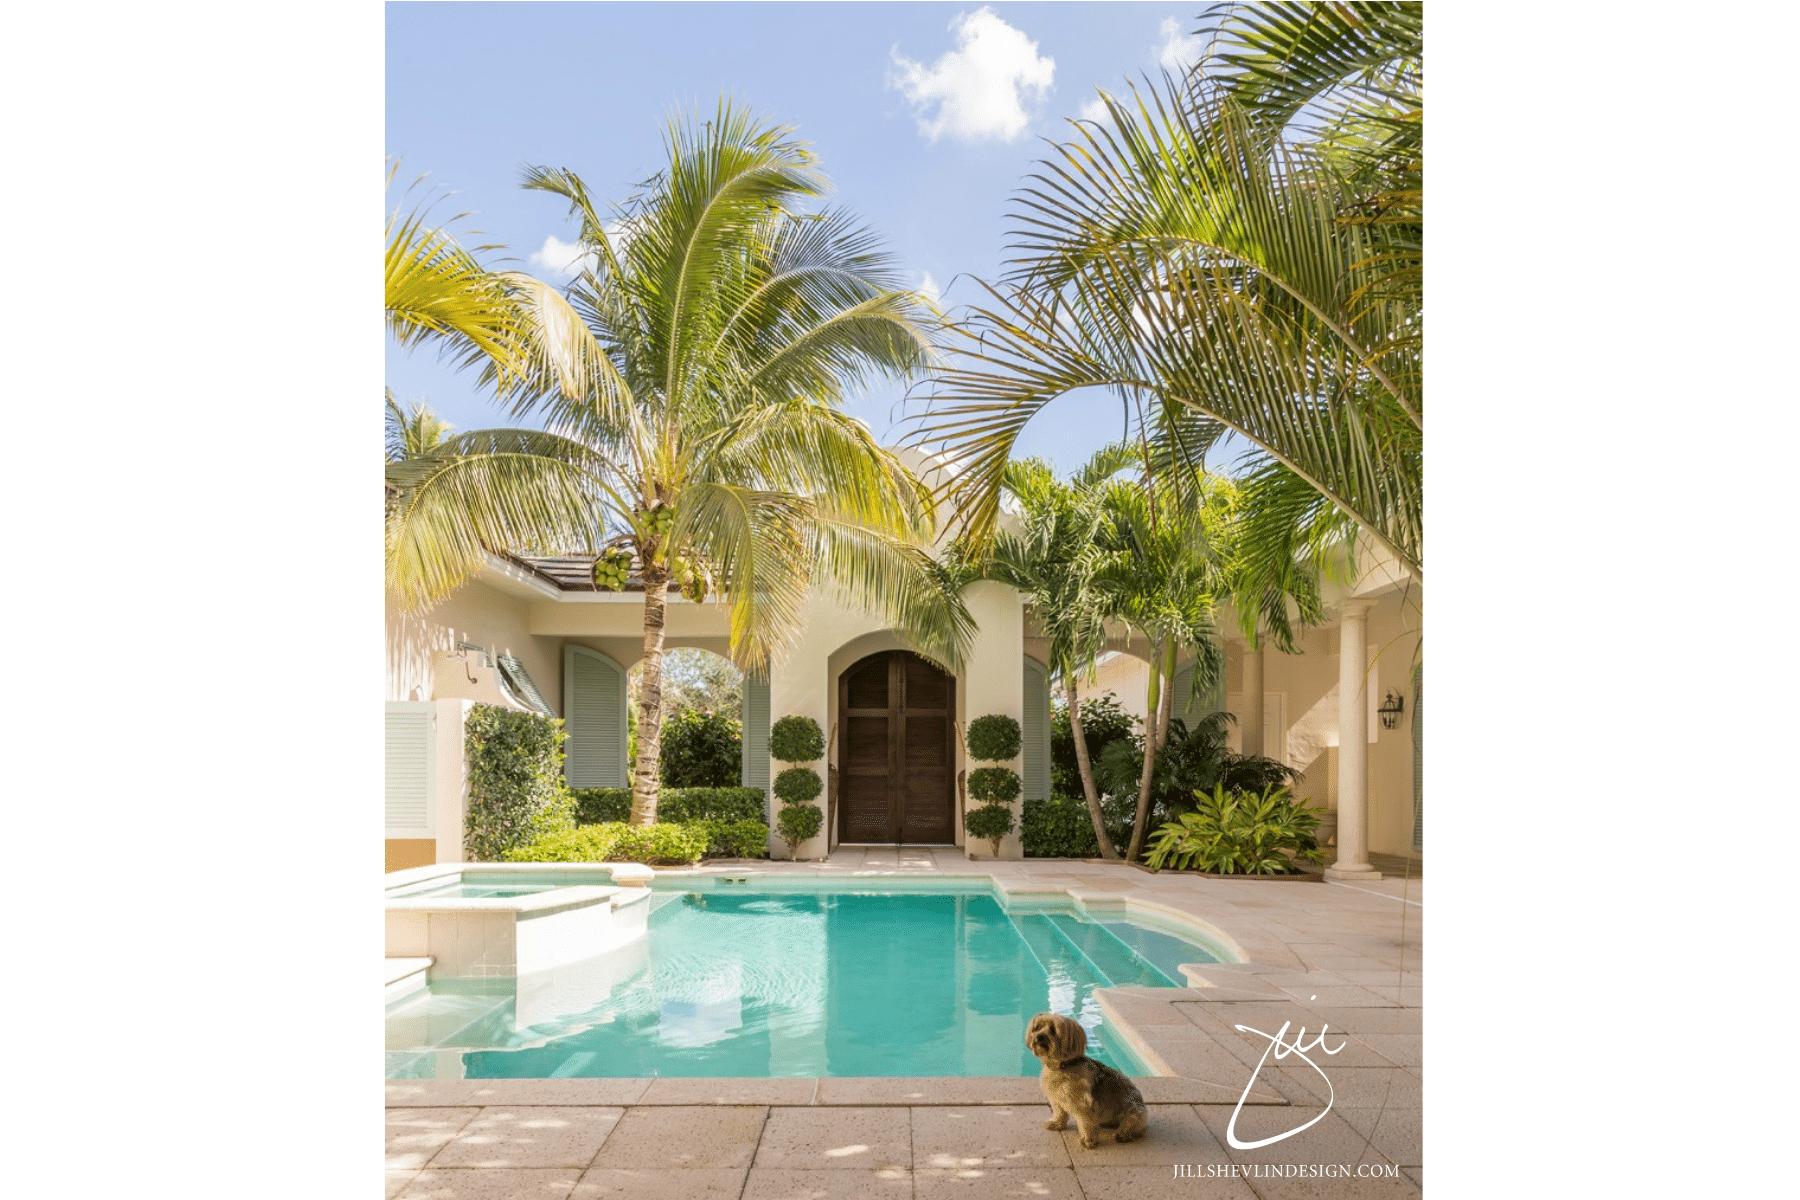 Jill Shevlin Design Vero Beach Interior Designer Courtyard Home